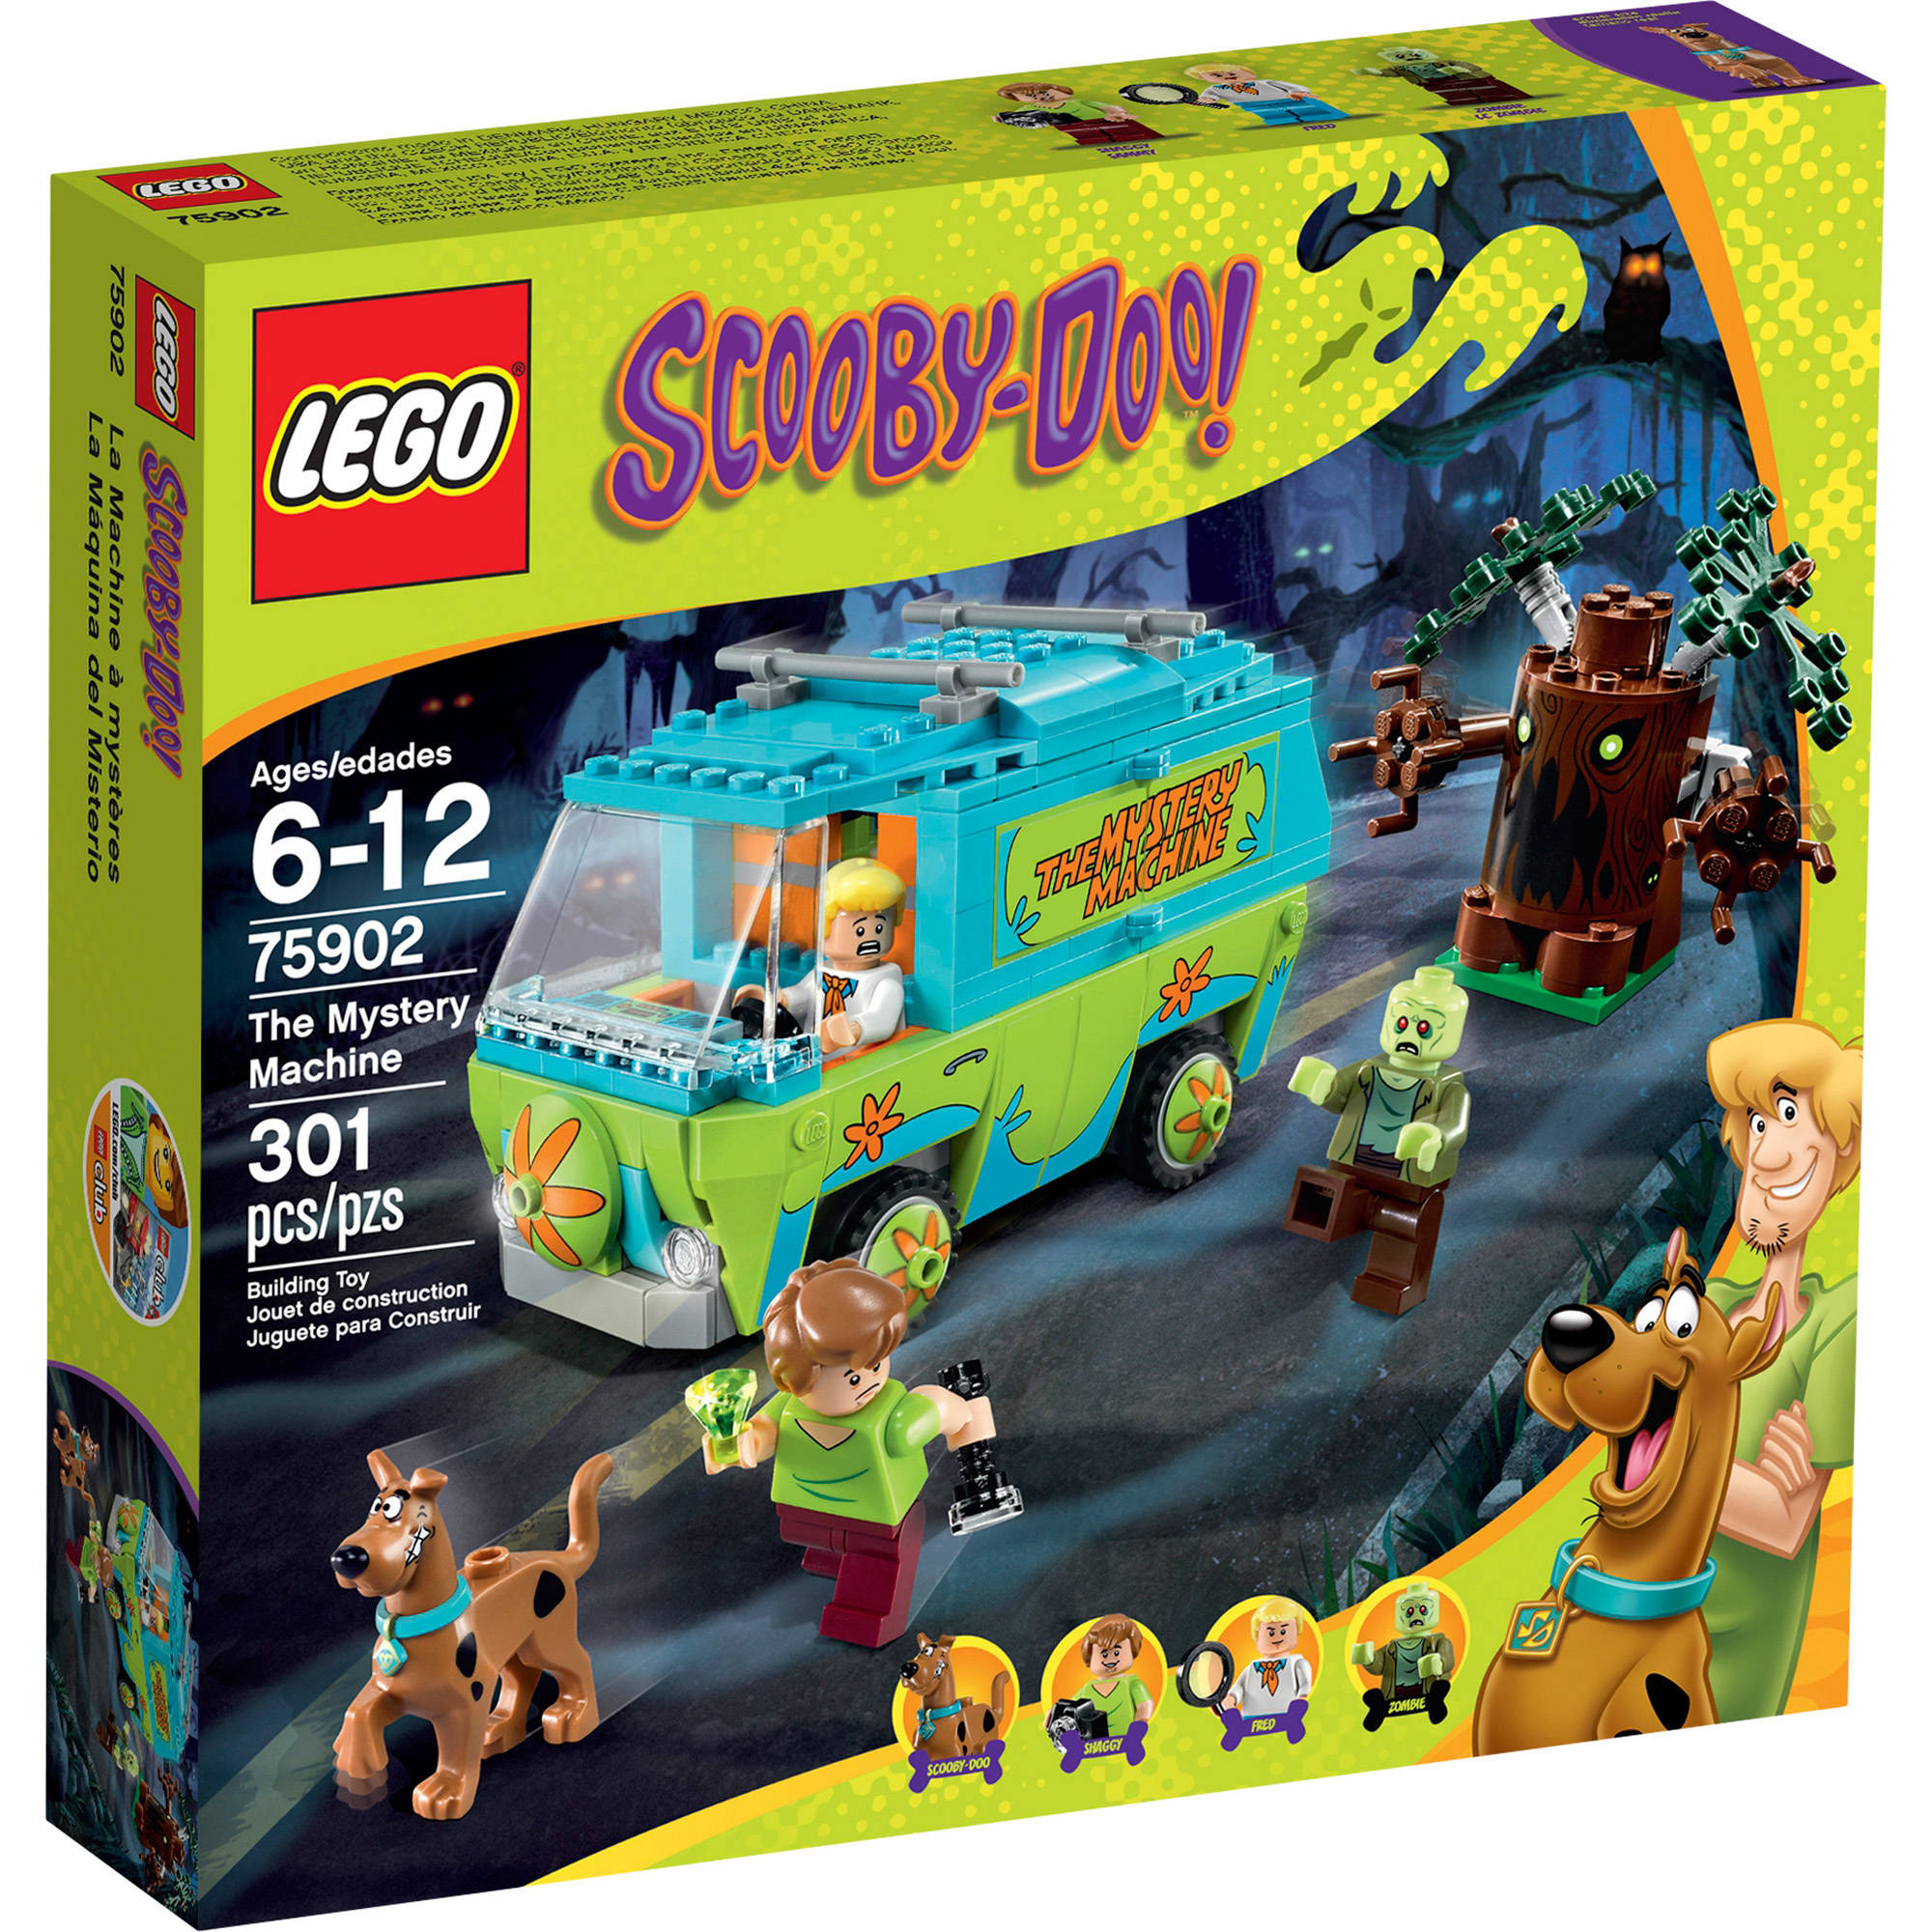 8e5aa5766a8c3 LEGO Scooby-Doo The Mystery Machine, 75902